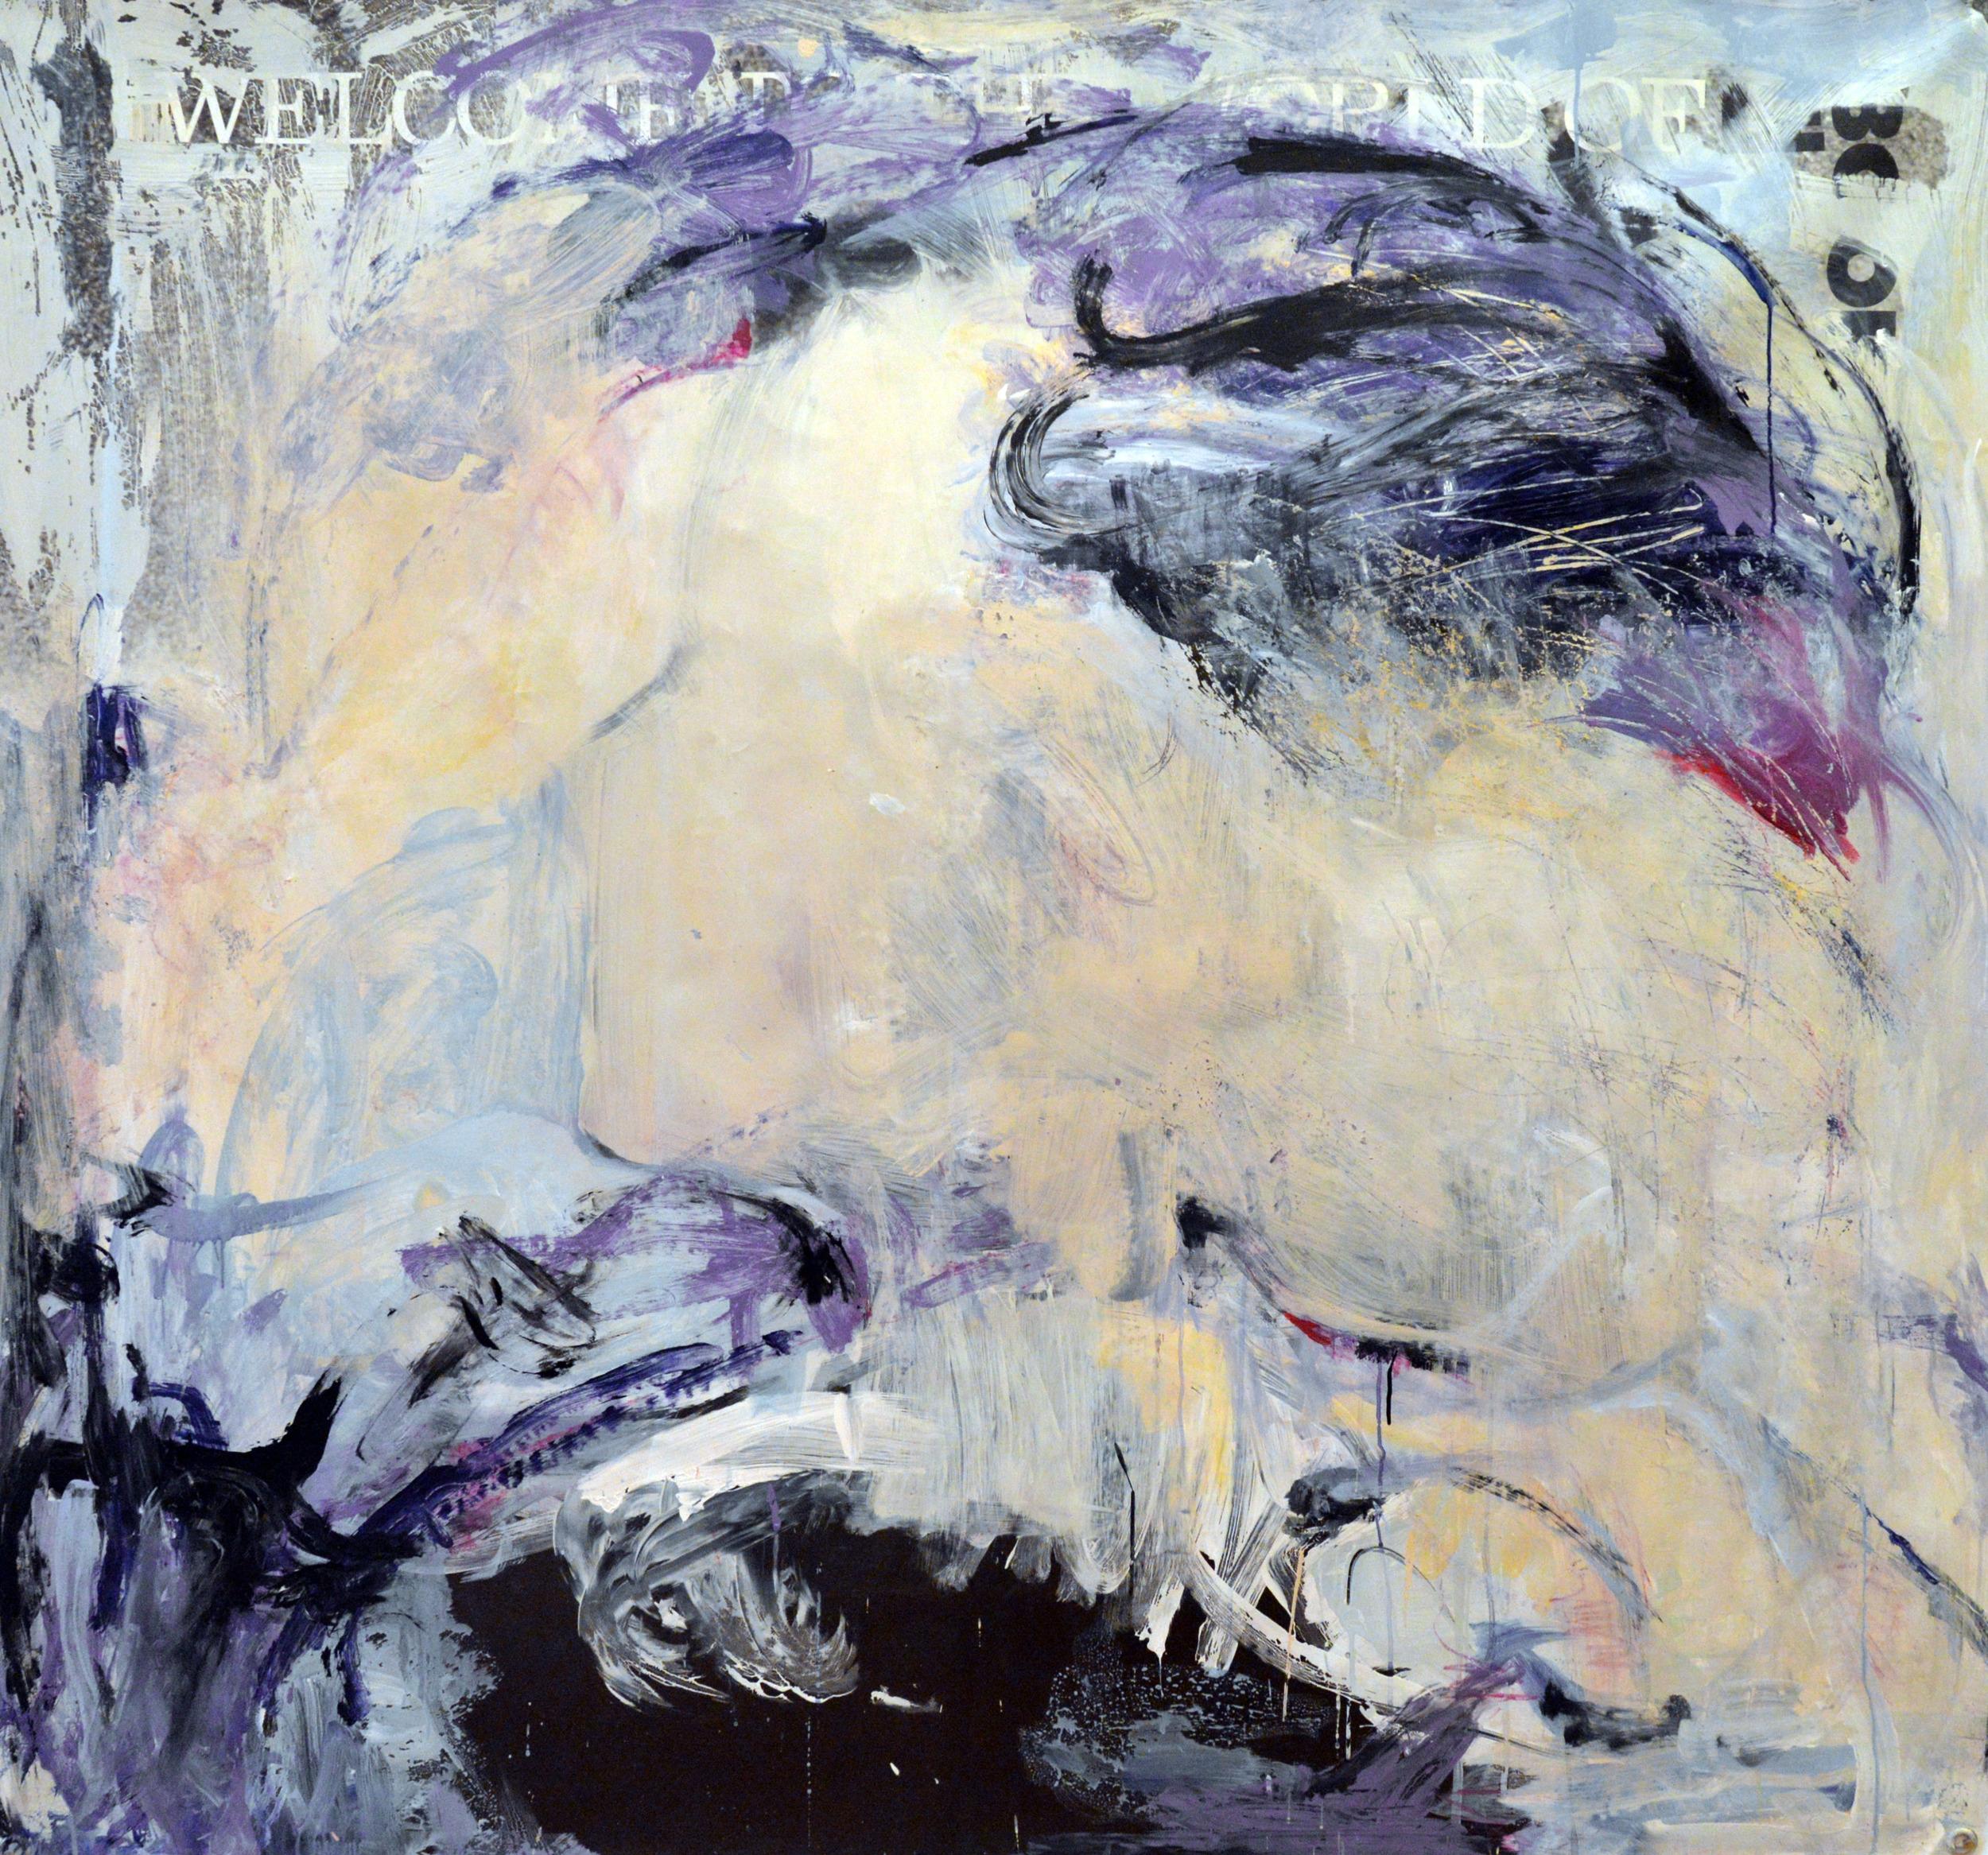 Explore, acrylic on vinyl, 2015